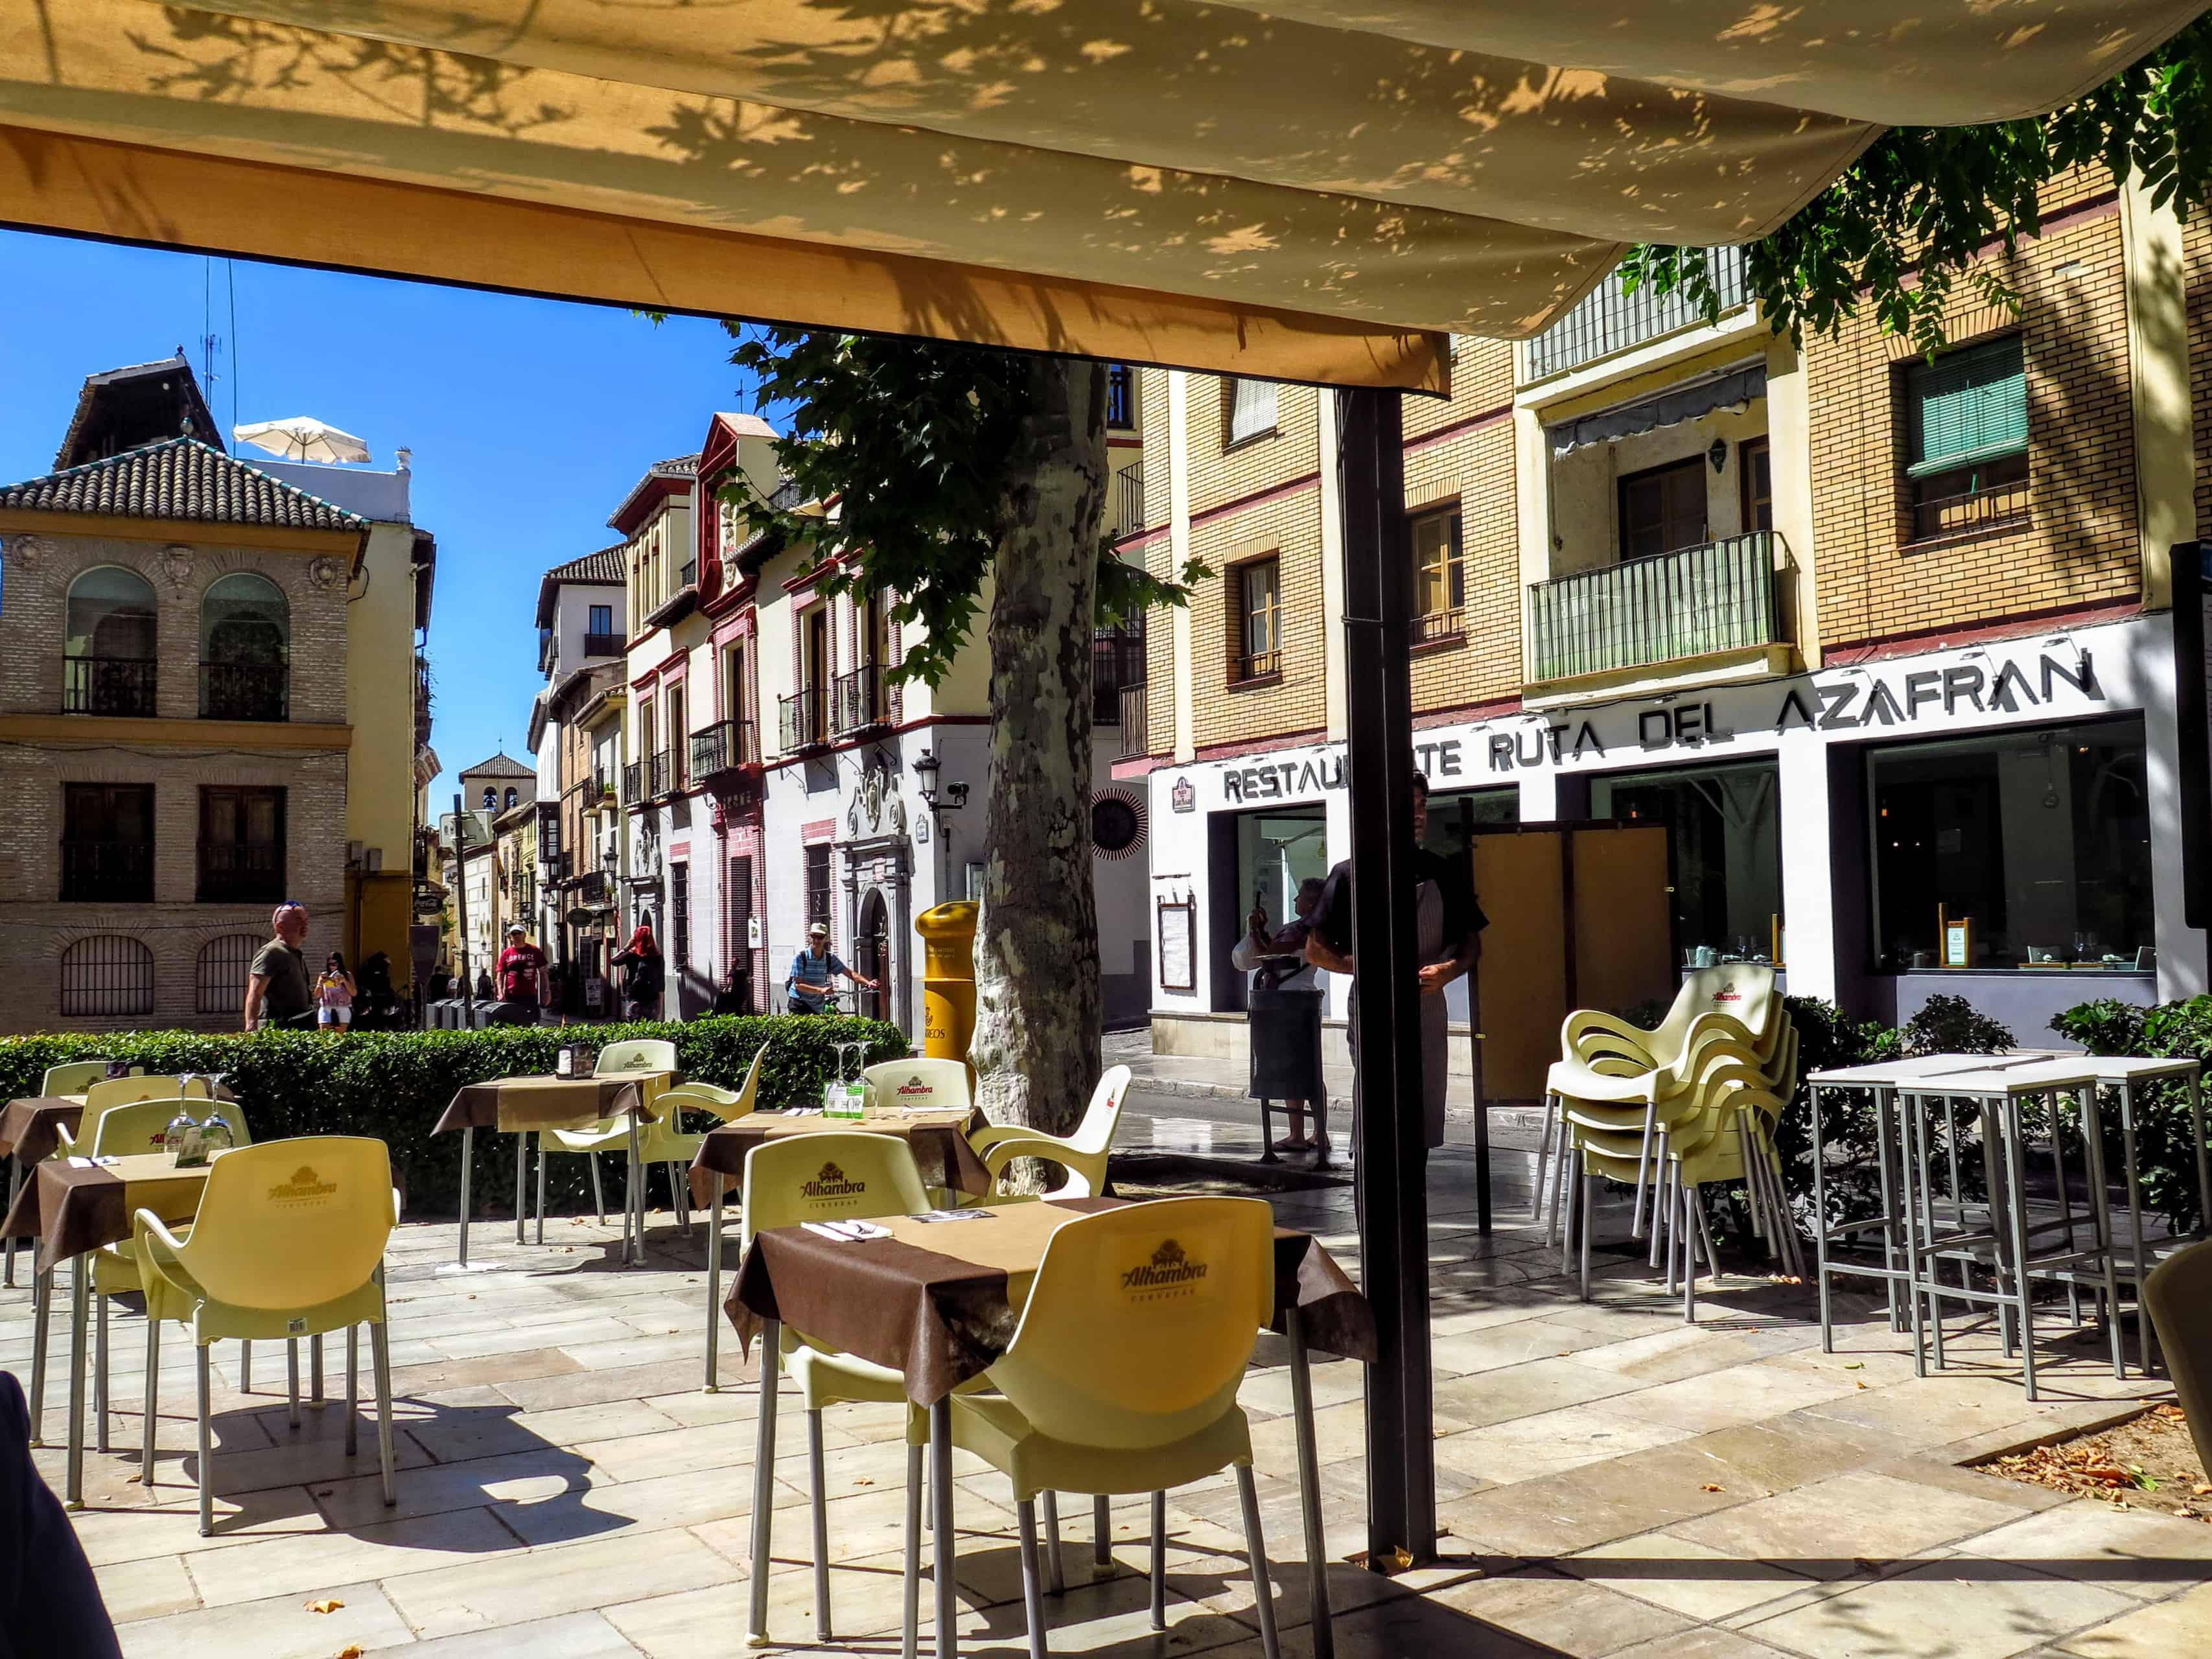 Restaurante em granada conhe a o ruta del azafr n - Restaurante oryza granada ...